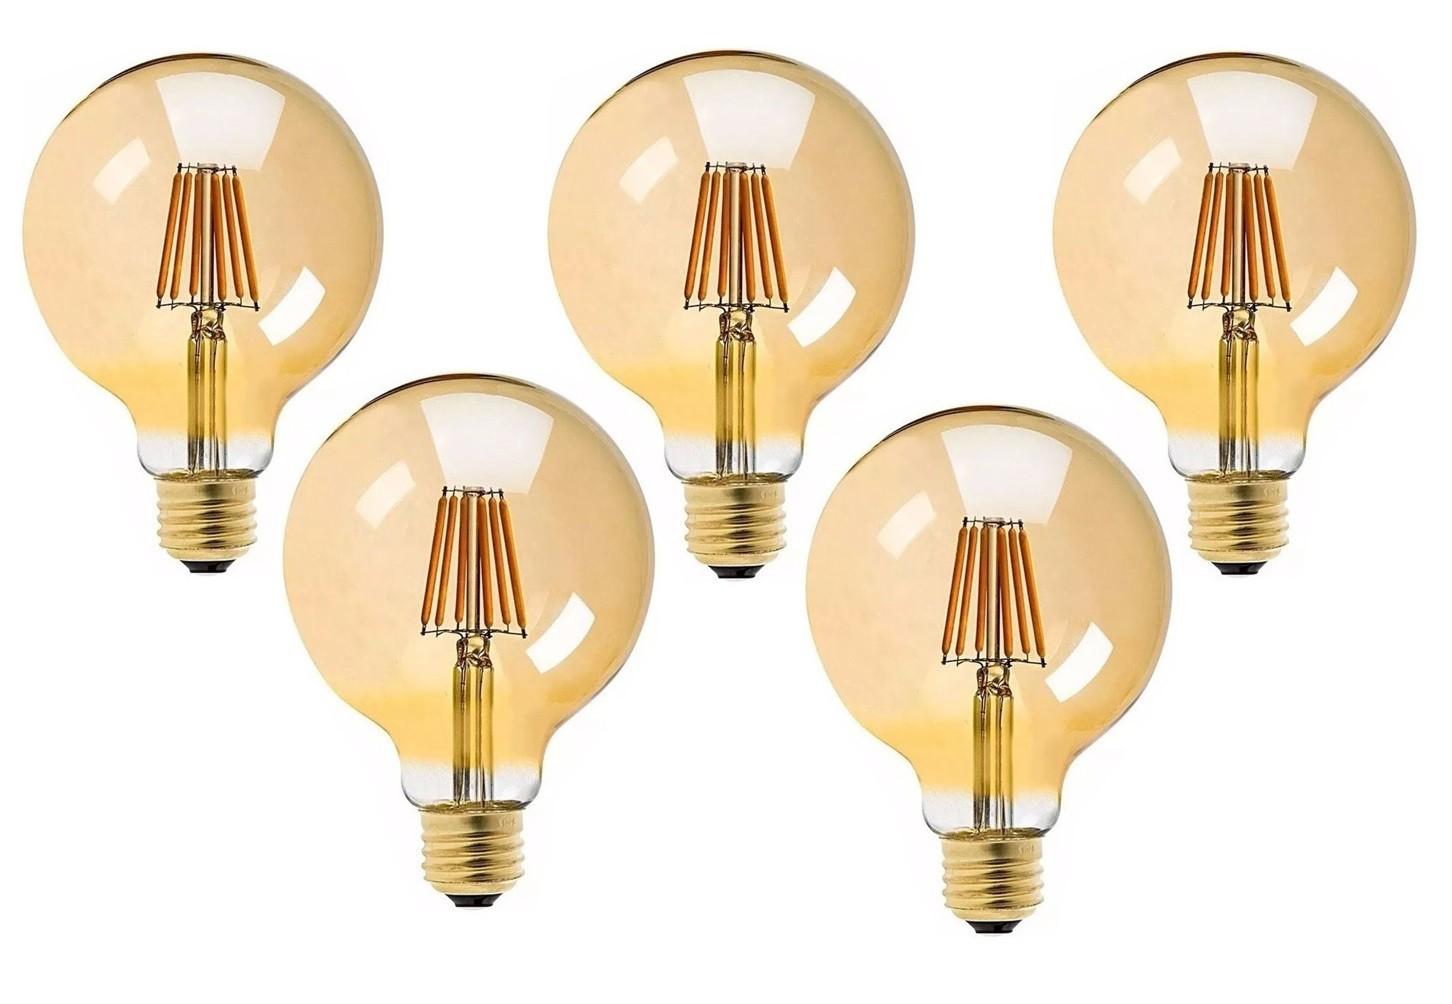 5 Lâmpadas G95 Retrô Decorativa Vintage Led 4w Bivolt